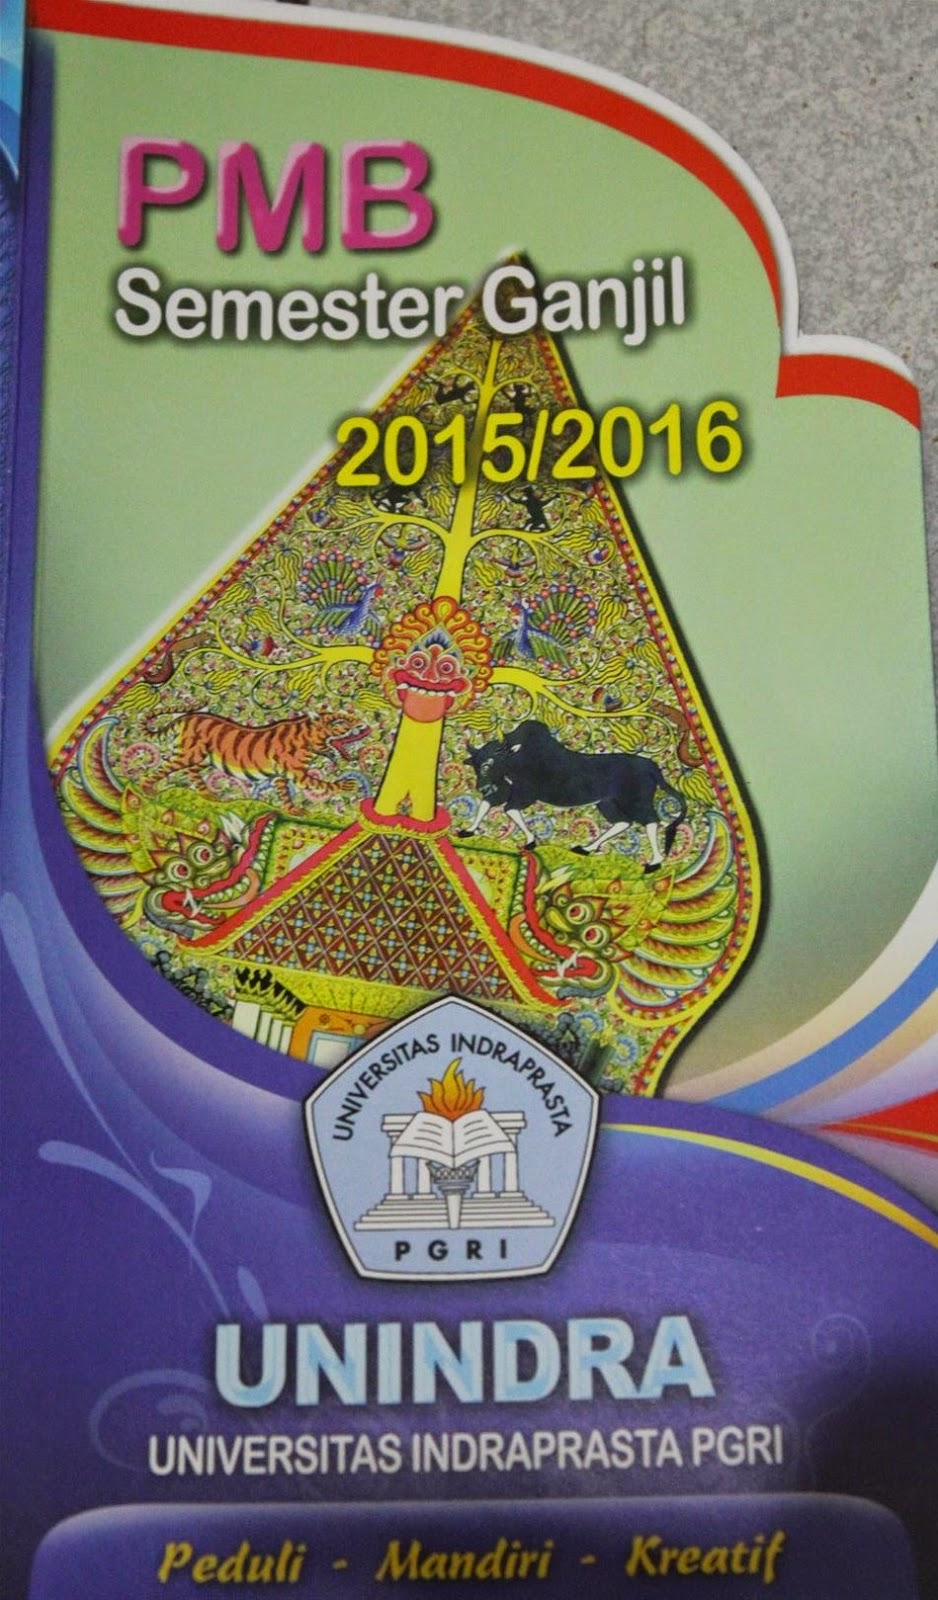 Penerimaan Mahasiswa Baru Unindra 2015-2016